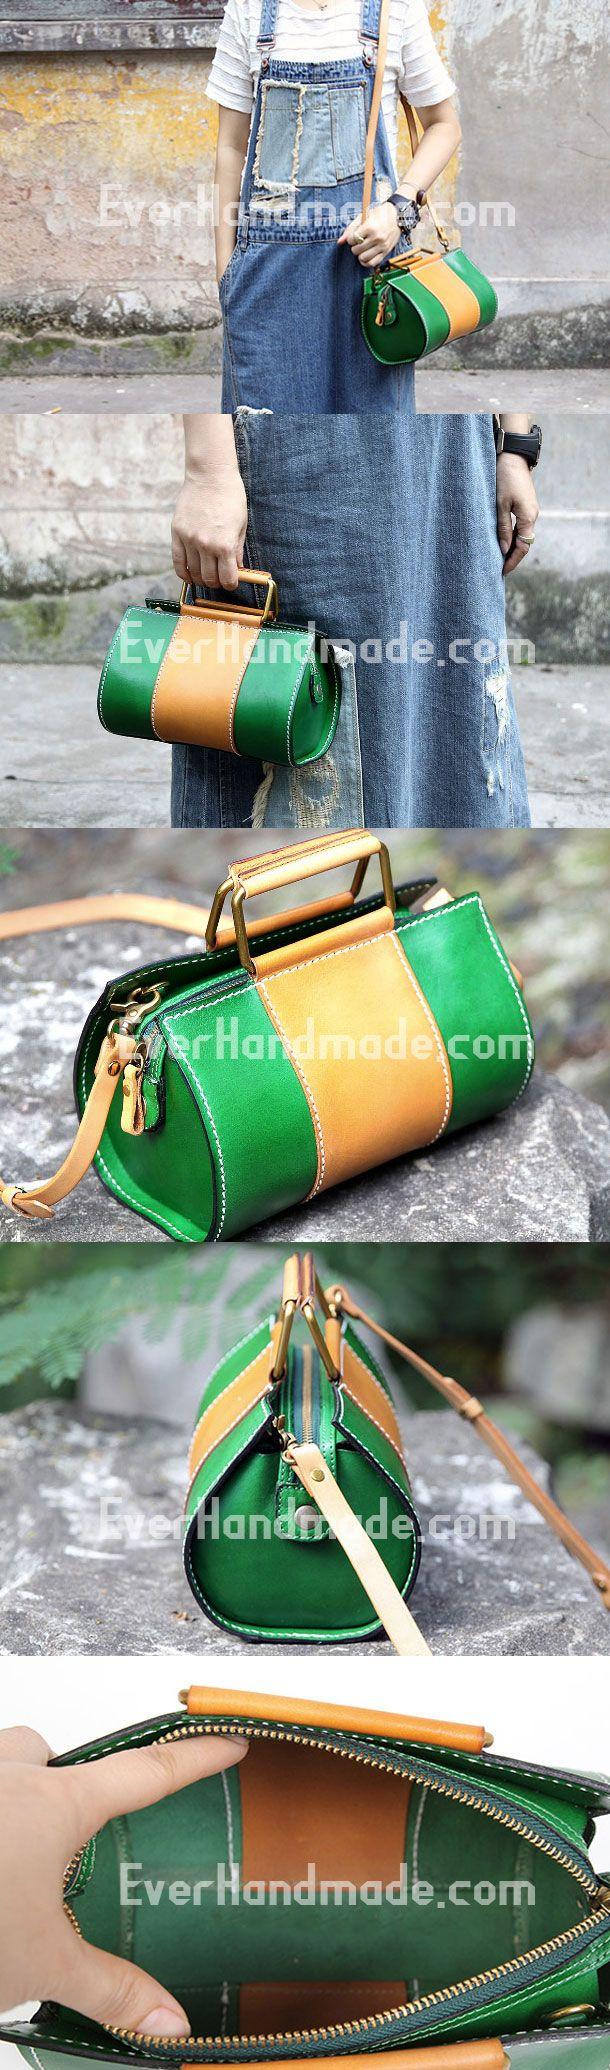 Handmade handbag cute purse leather crossbody bag shoulder bag women